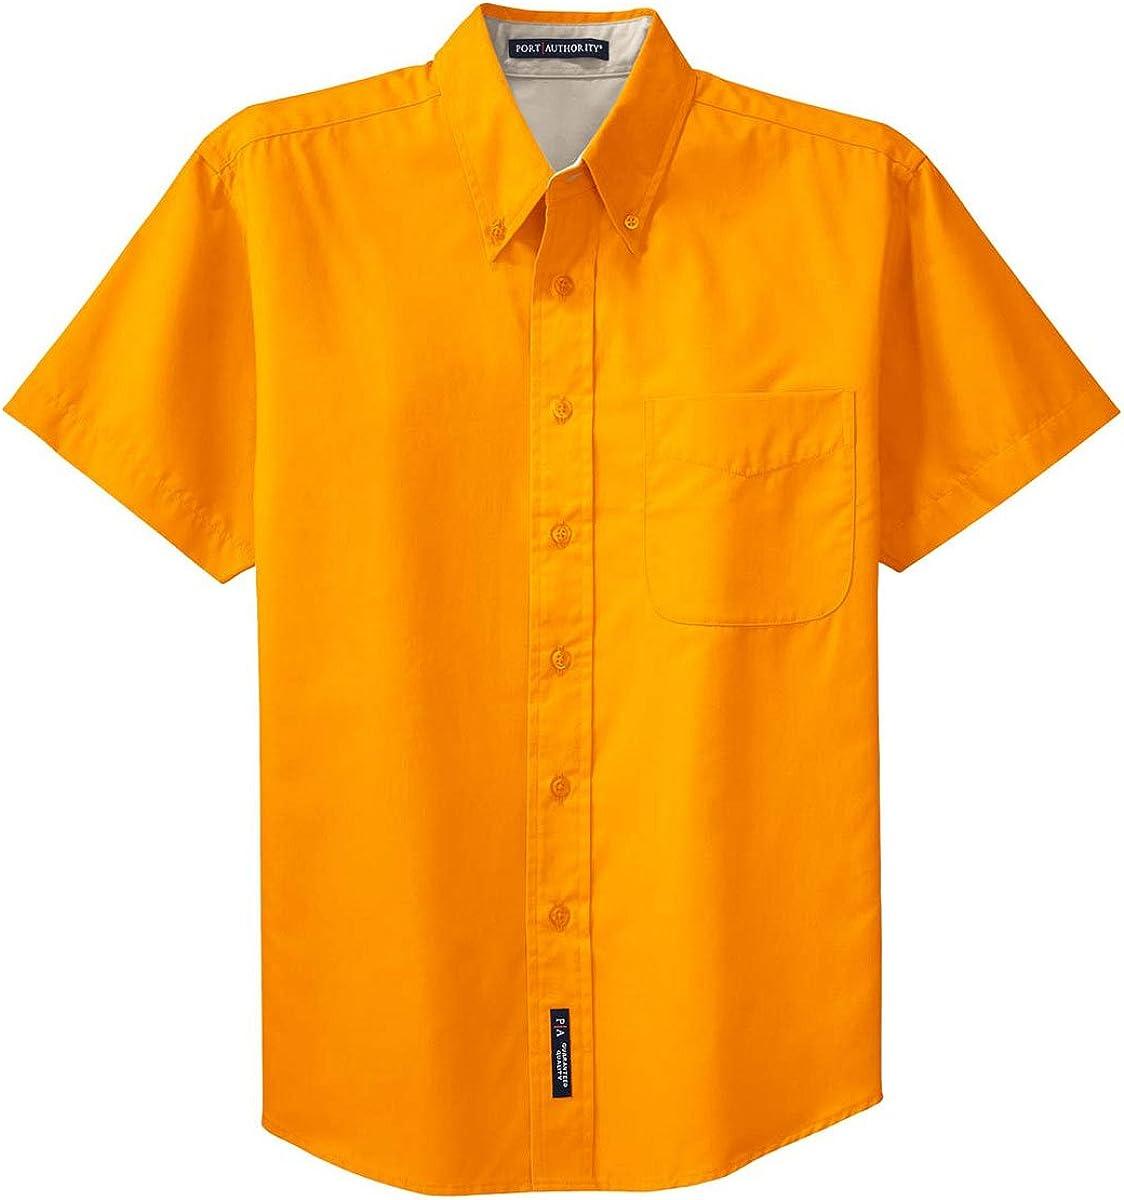 Autoridad Portuaria de Hombre Camiseta de Manga Corta de f/ácil Cuidado